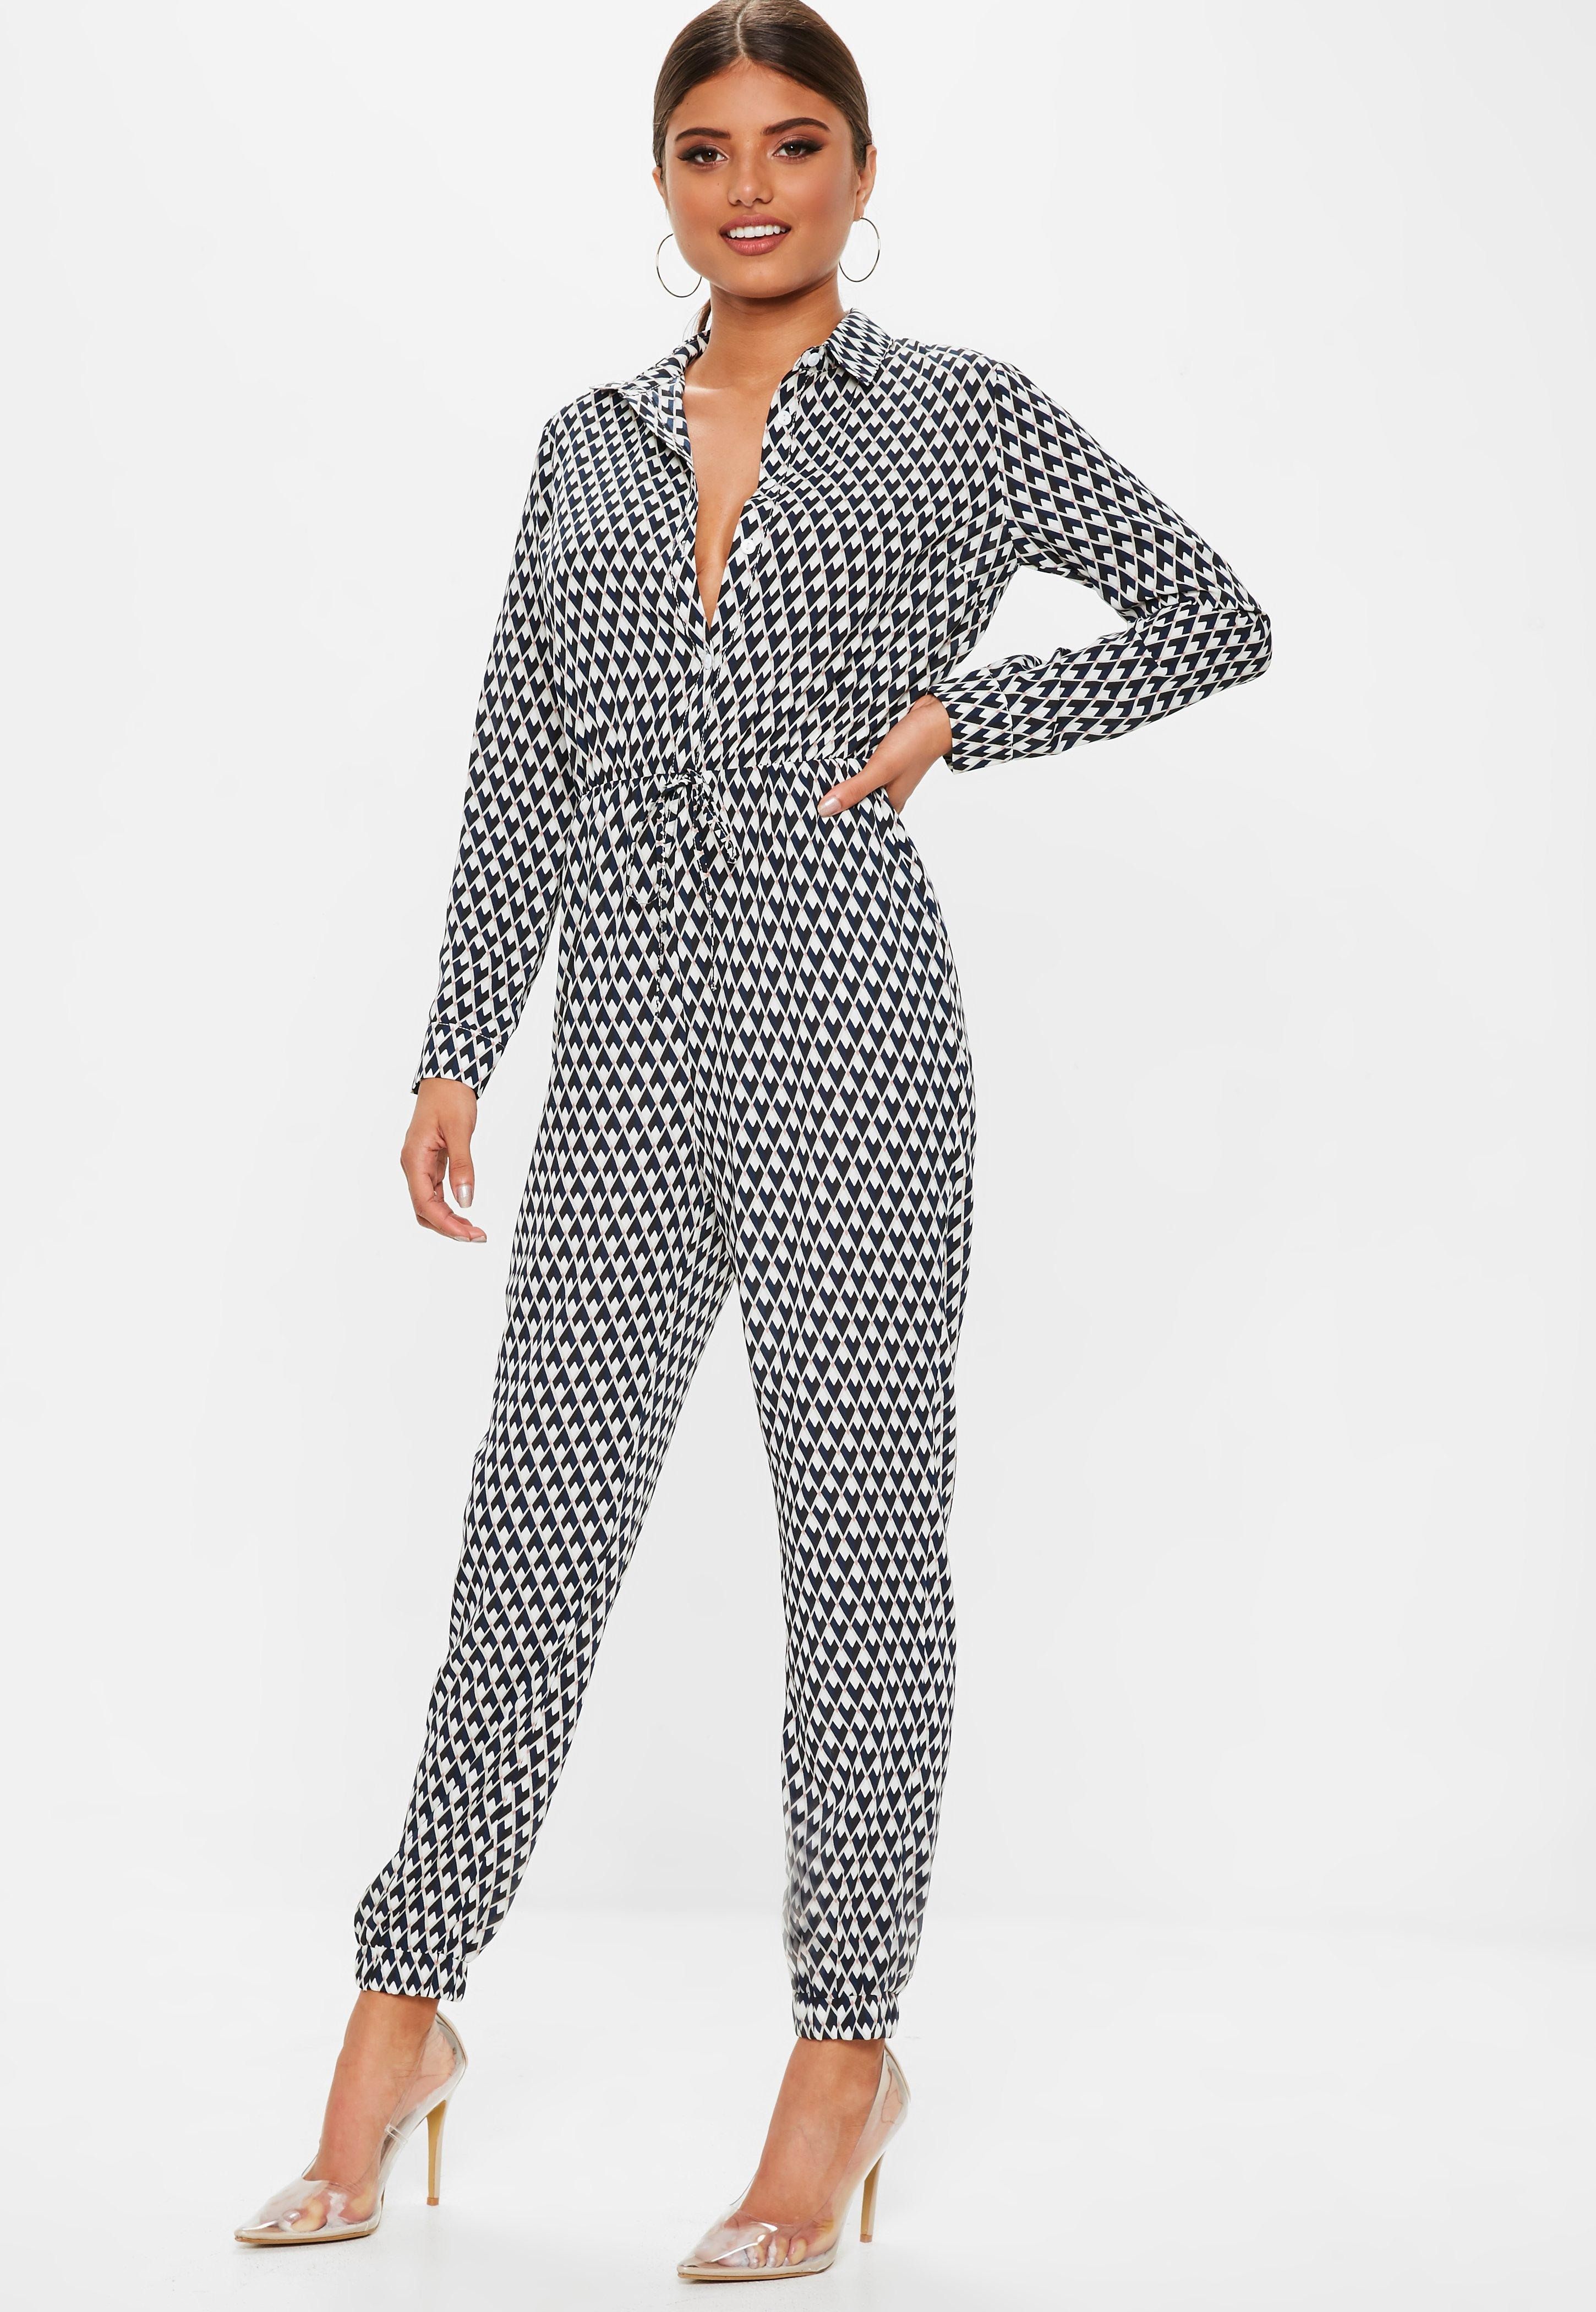 7fa4f602db4 Utility Jumpsuits - Jumpsuits - Clothing